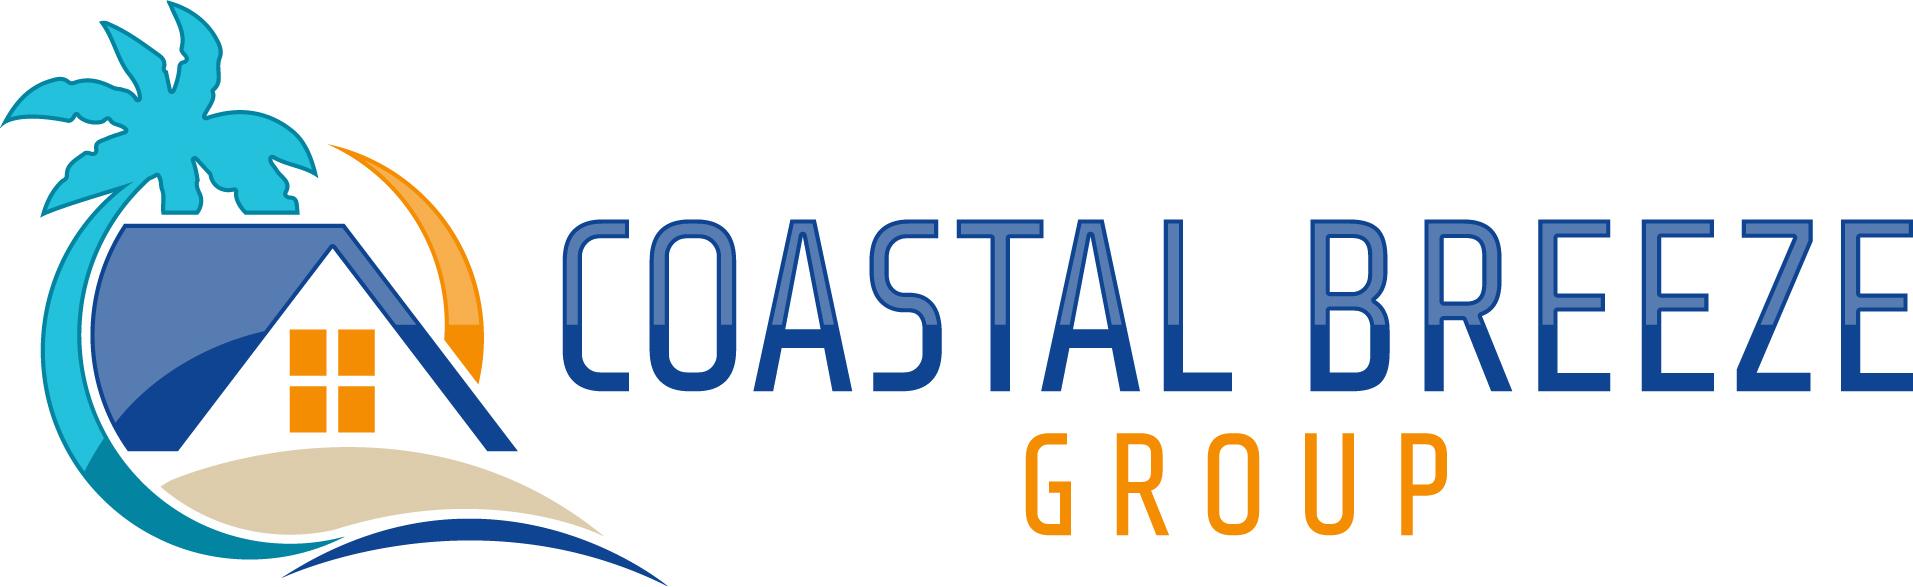 https://www.coastalbreezegroup.com